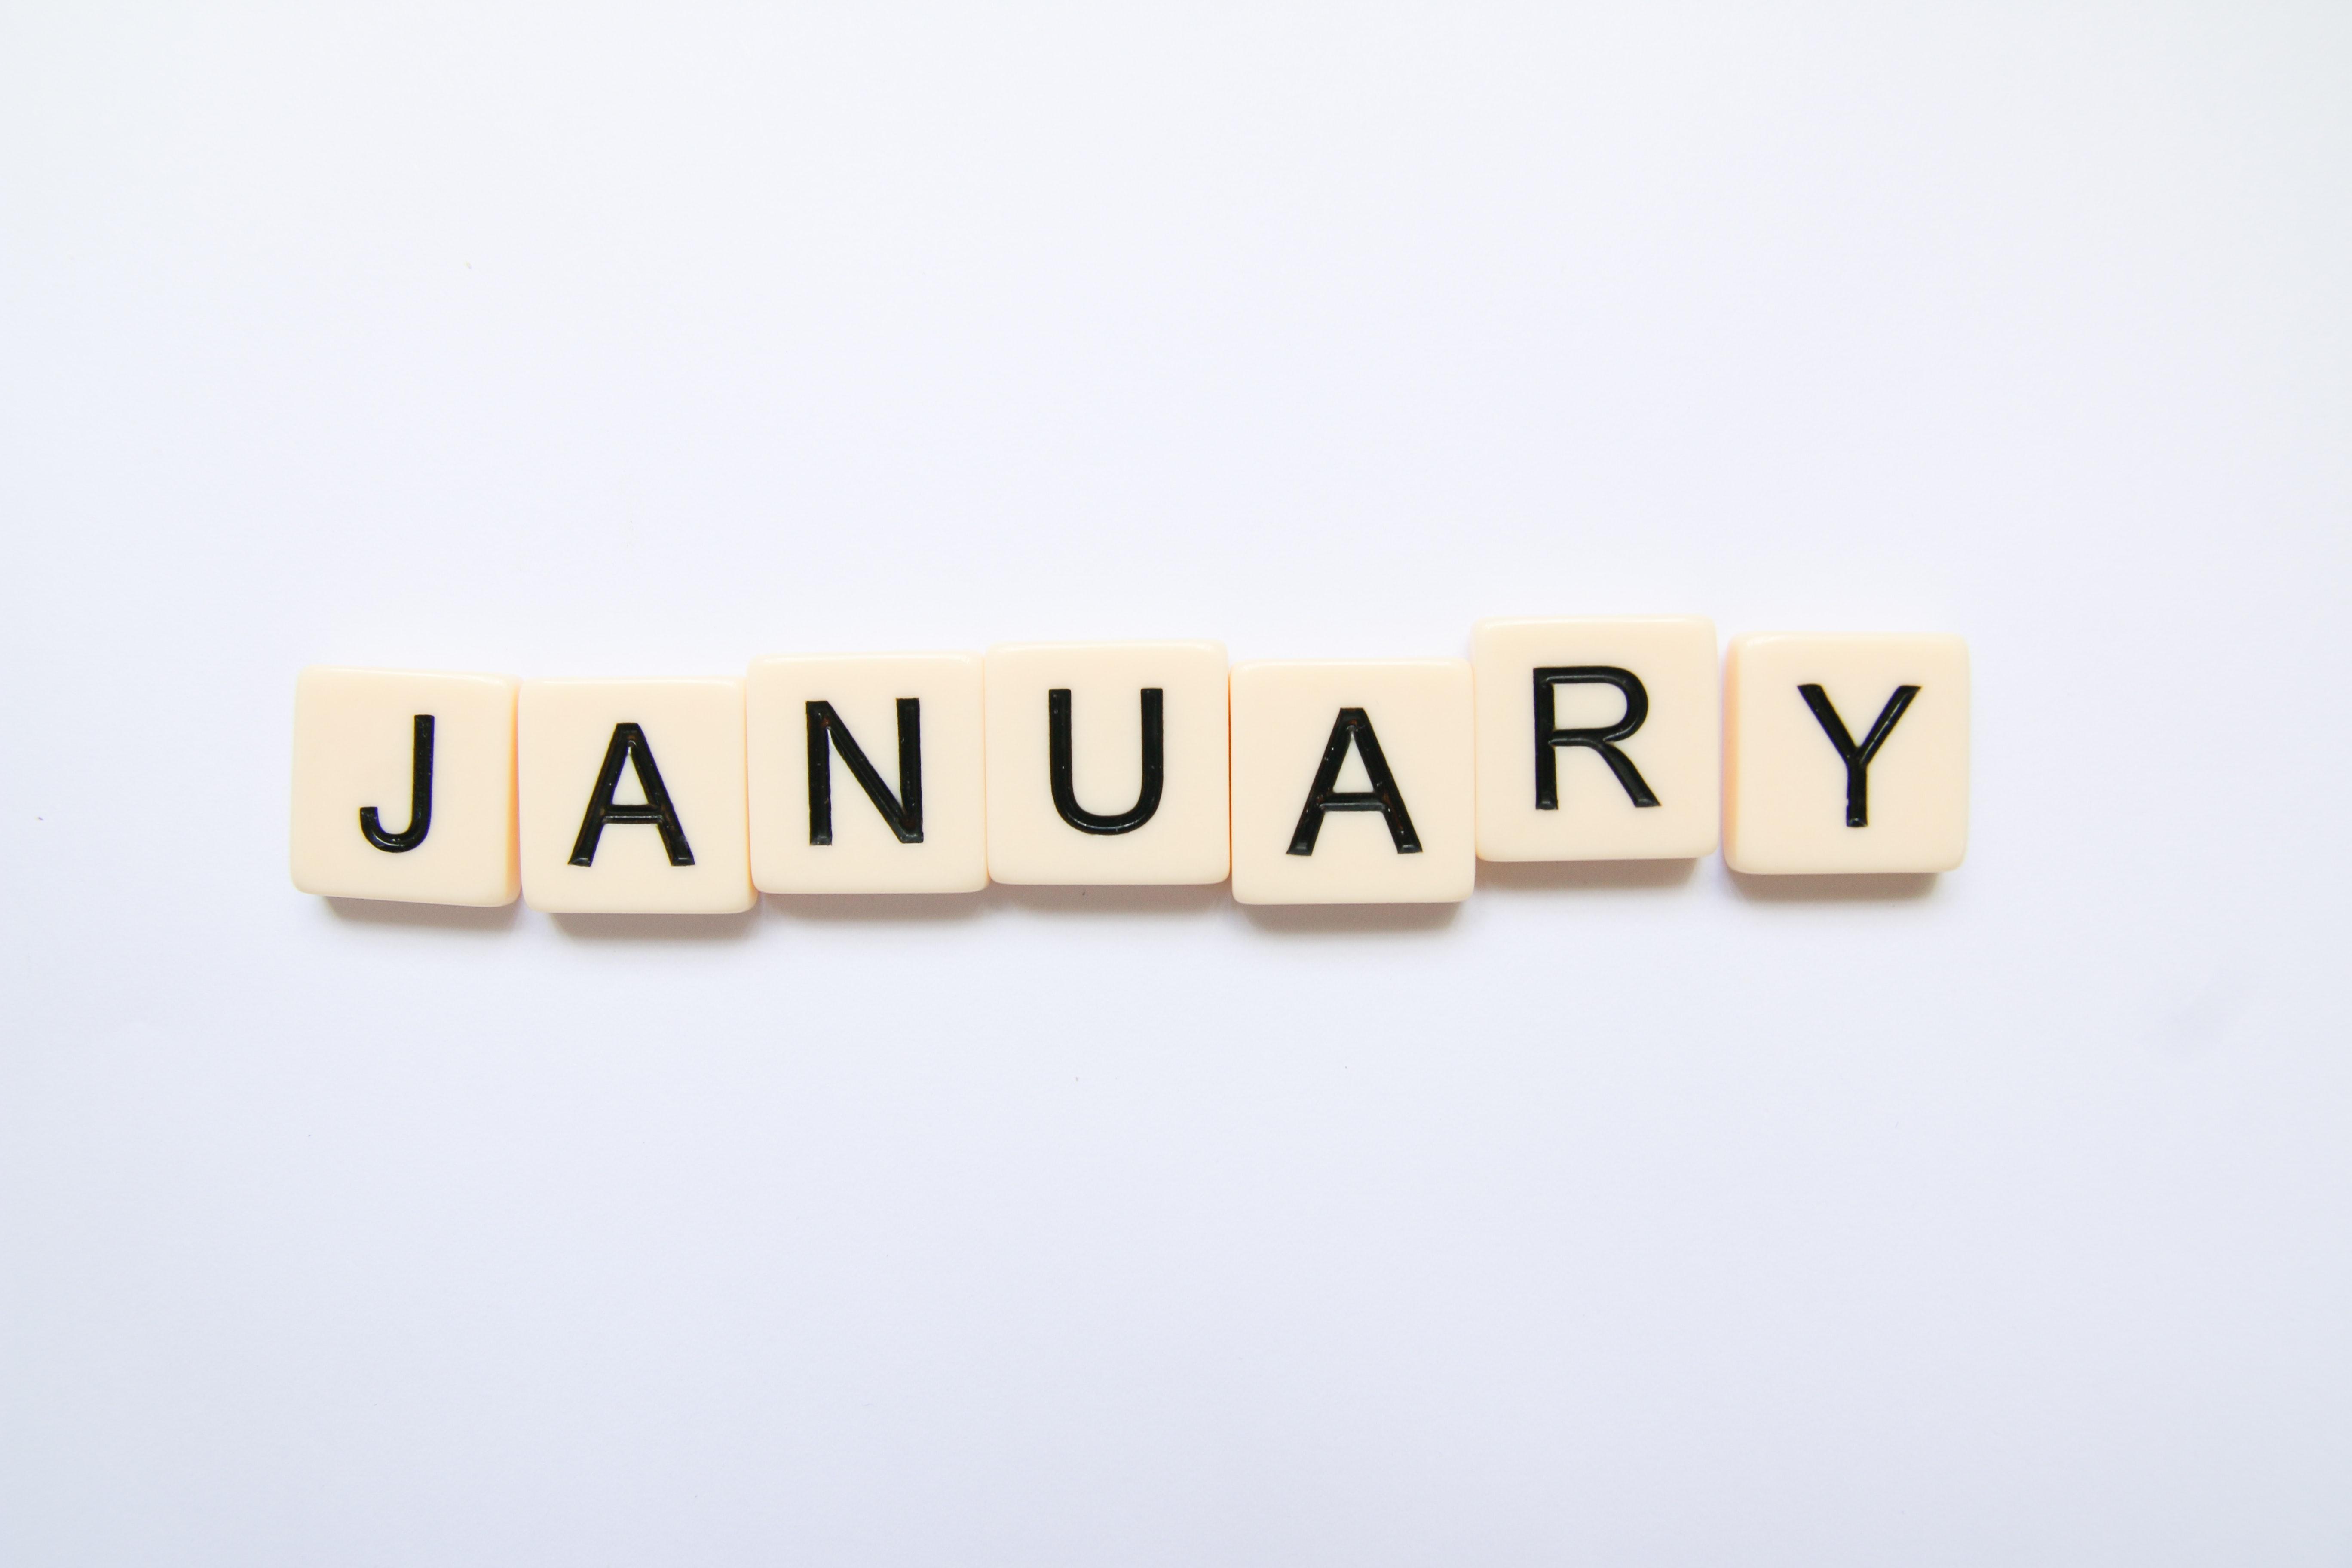 January Market Review Thumbnail